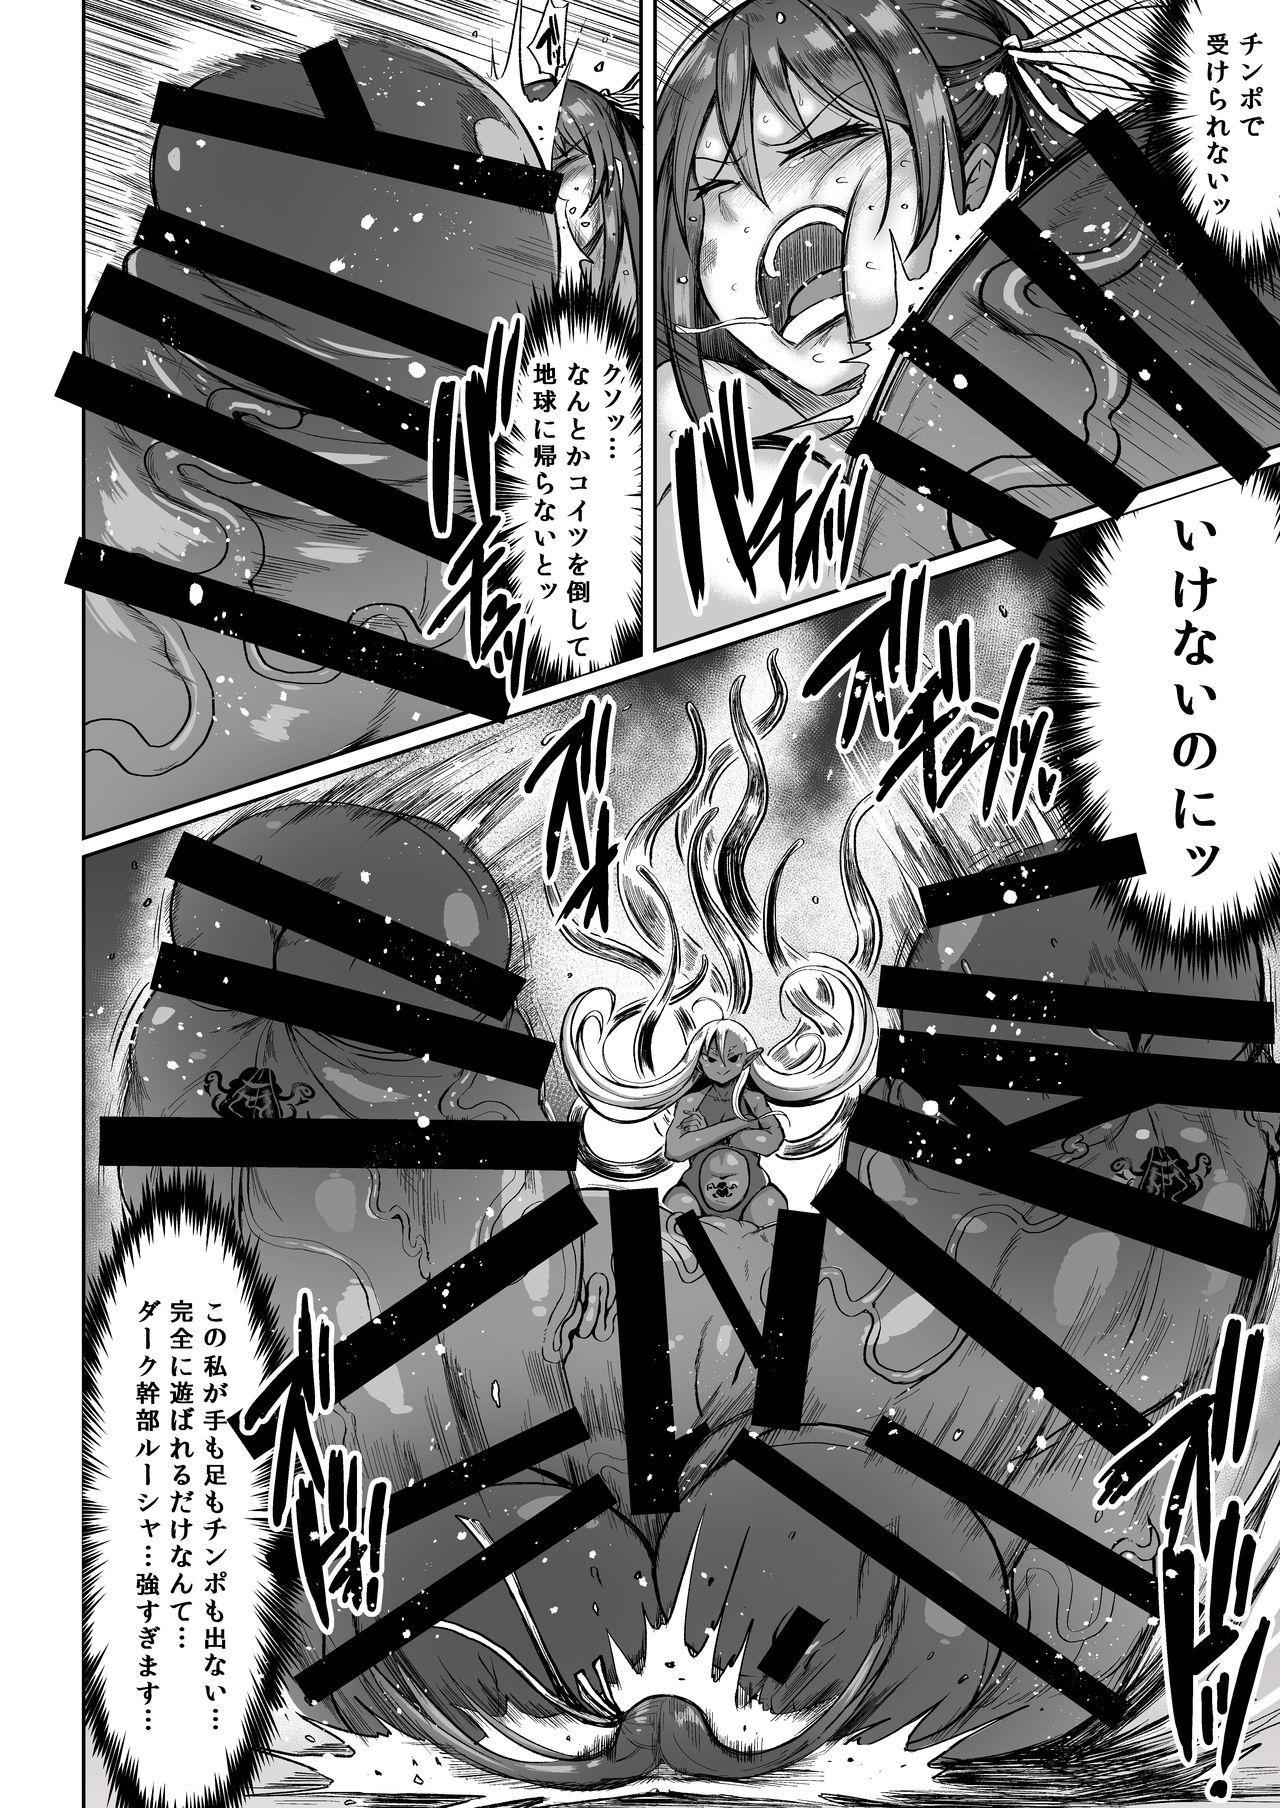 Choukon Senshi Justimara 2 7